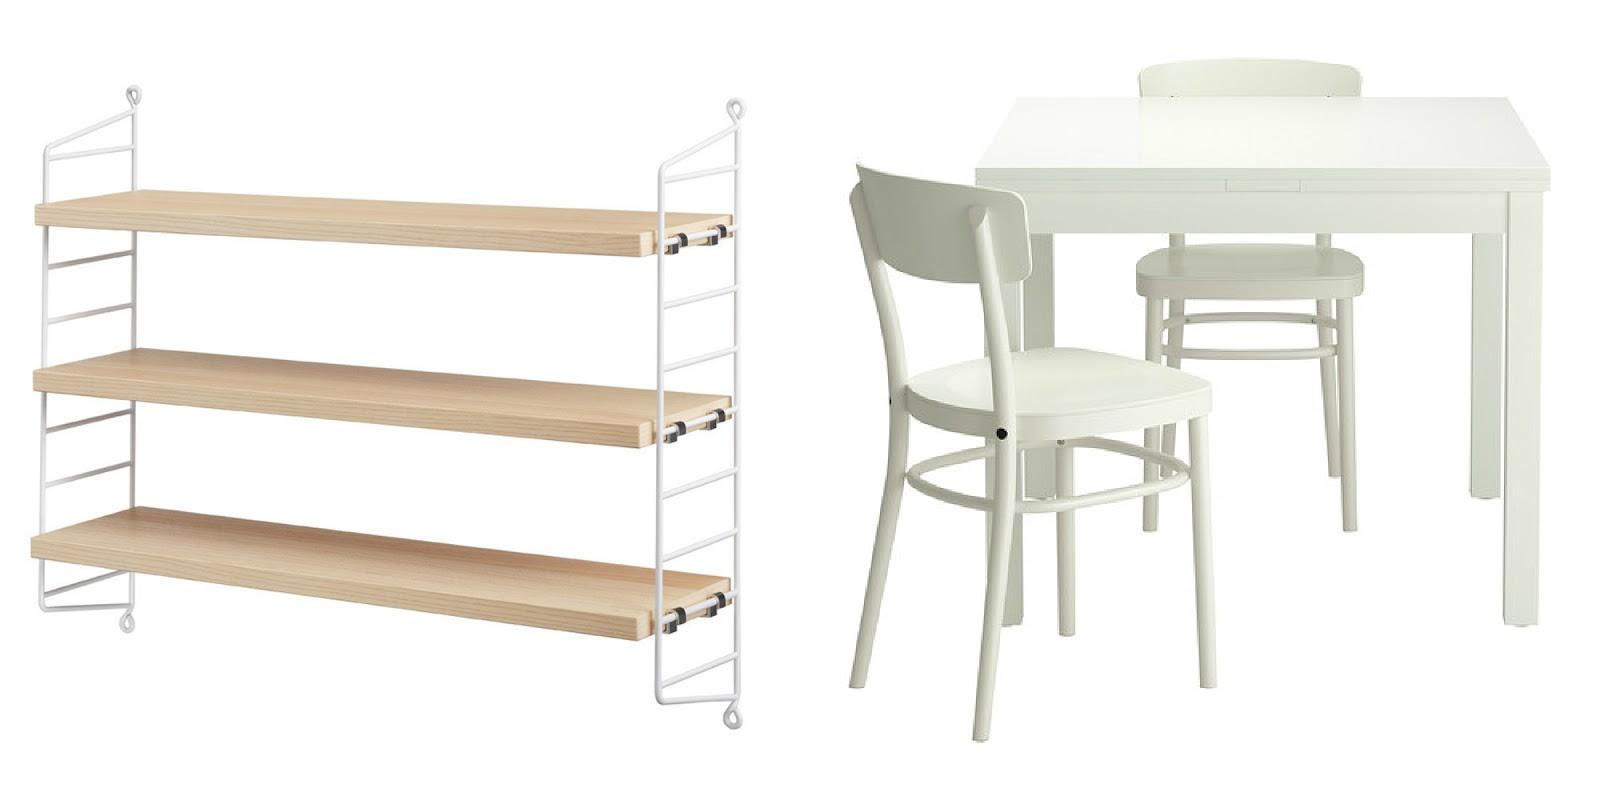 Come arredare casa blog arredamento part 4 - Maison du monde tavolo rotondo ...